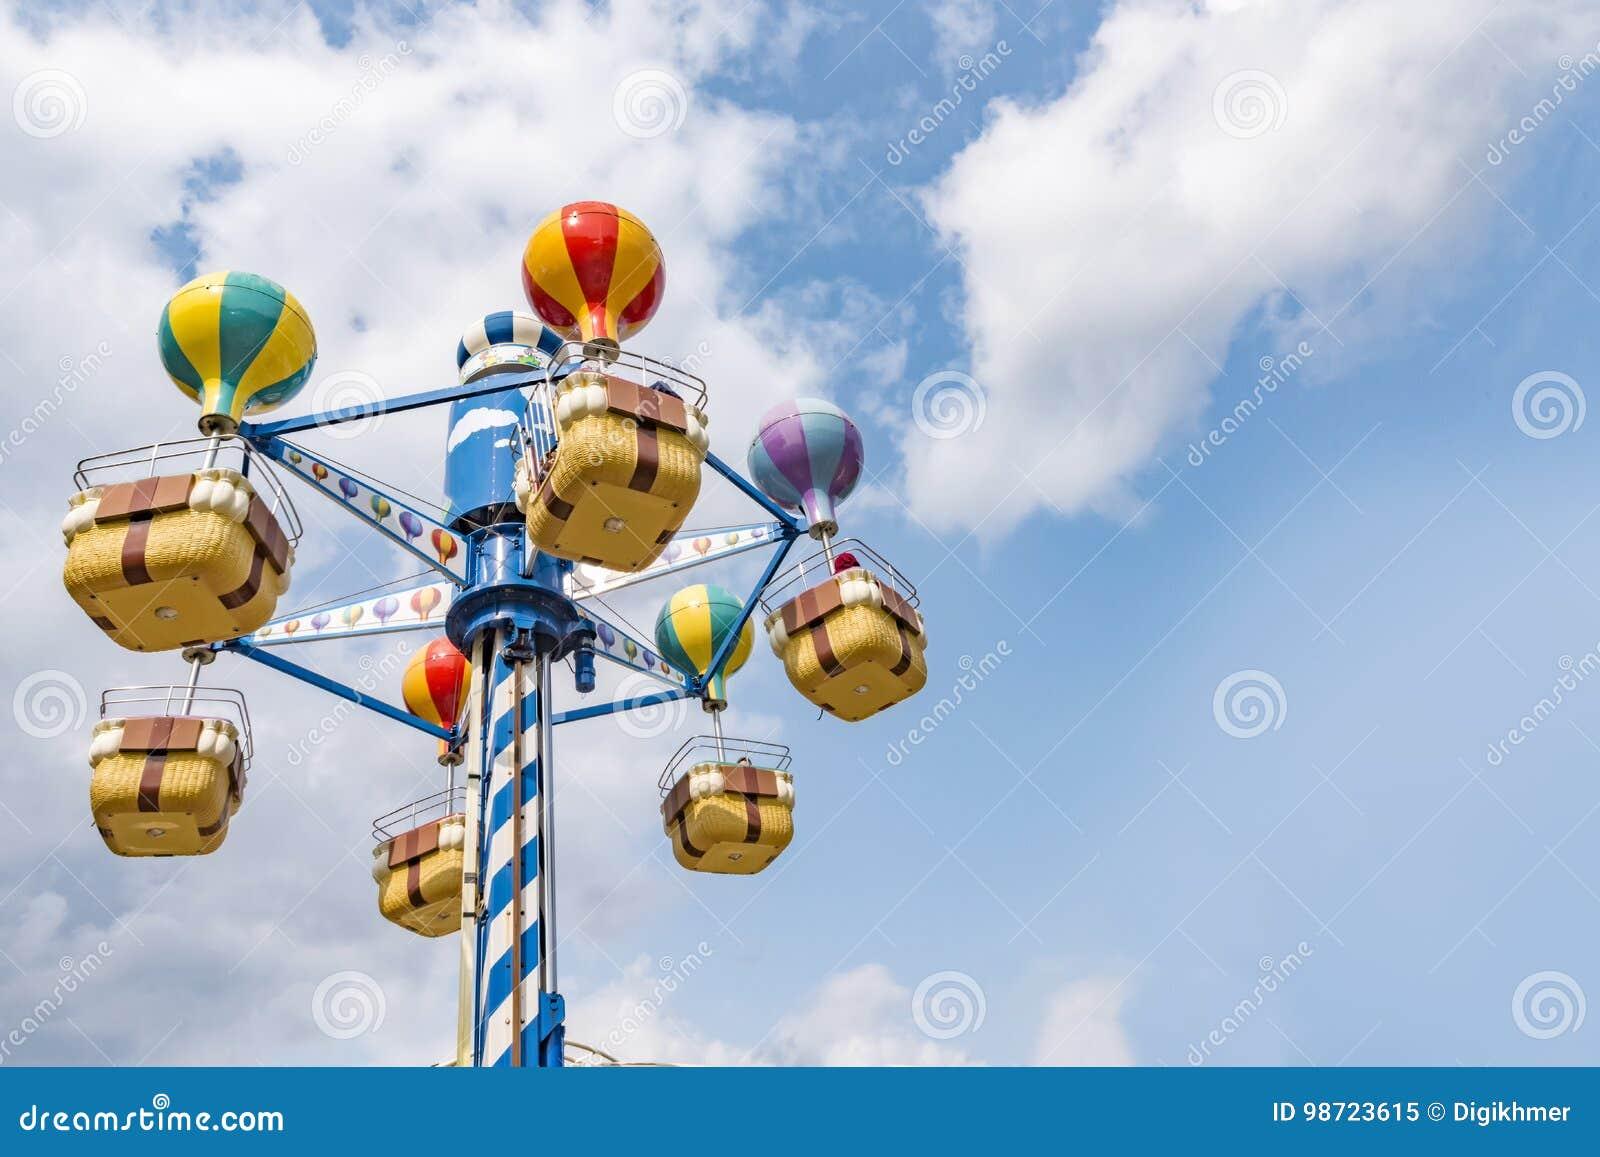 Aerial merry go round carousel